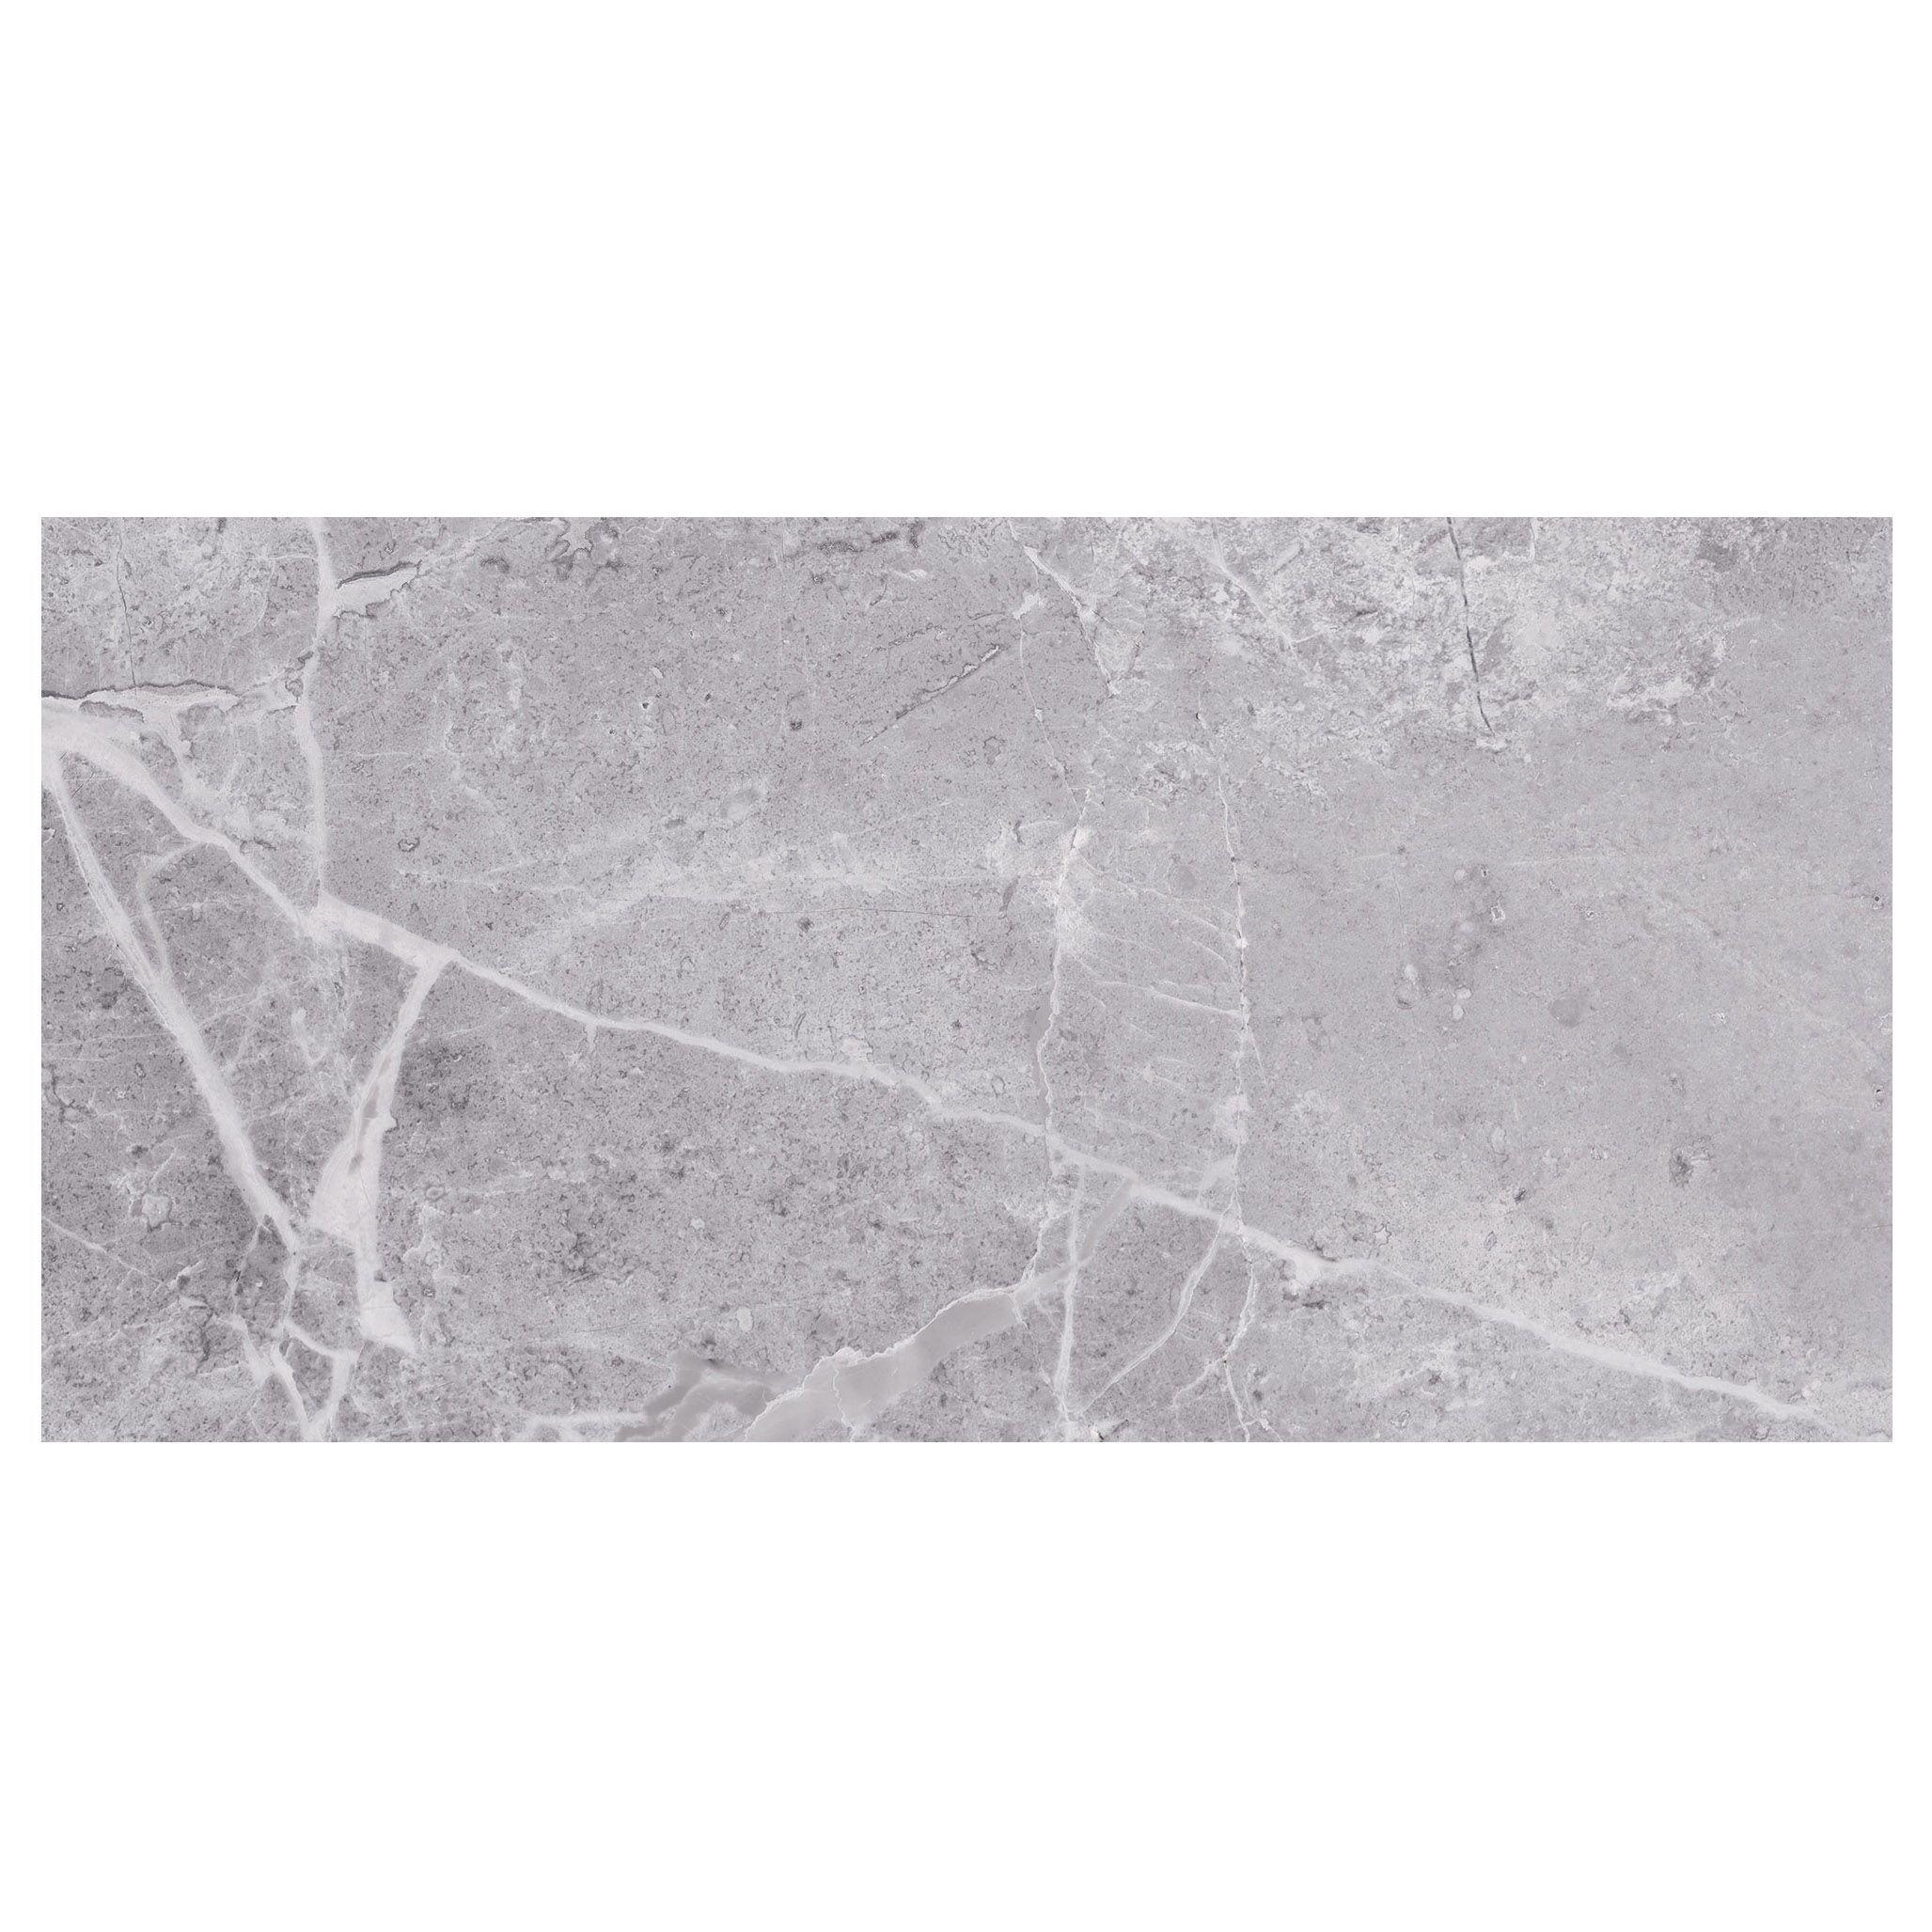 Urban White Stone Effect Ceramic Wall Floor Tile Pack: Silverthorne Silver Marble Stone Effect Ceramic Wall Tile